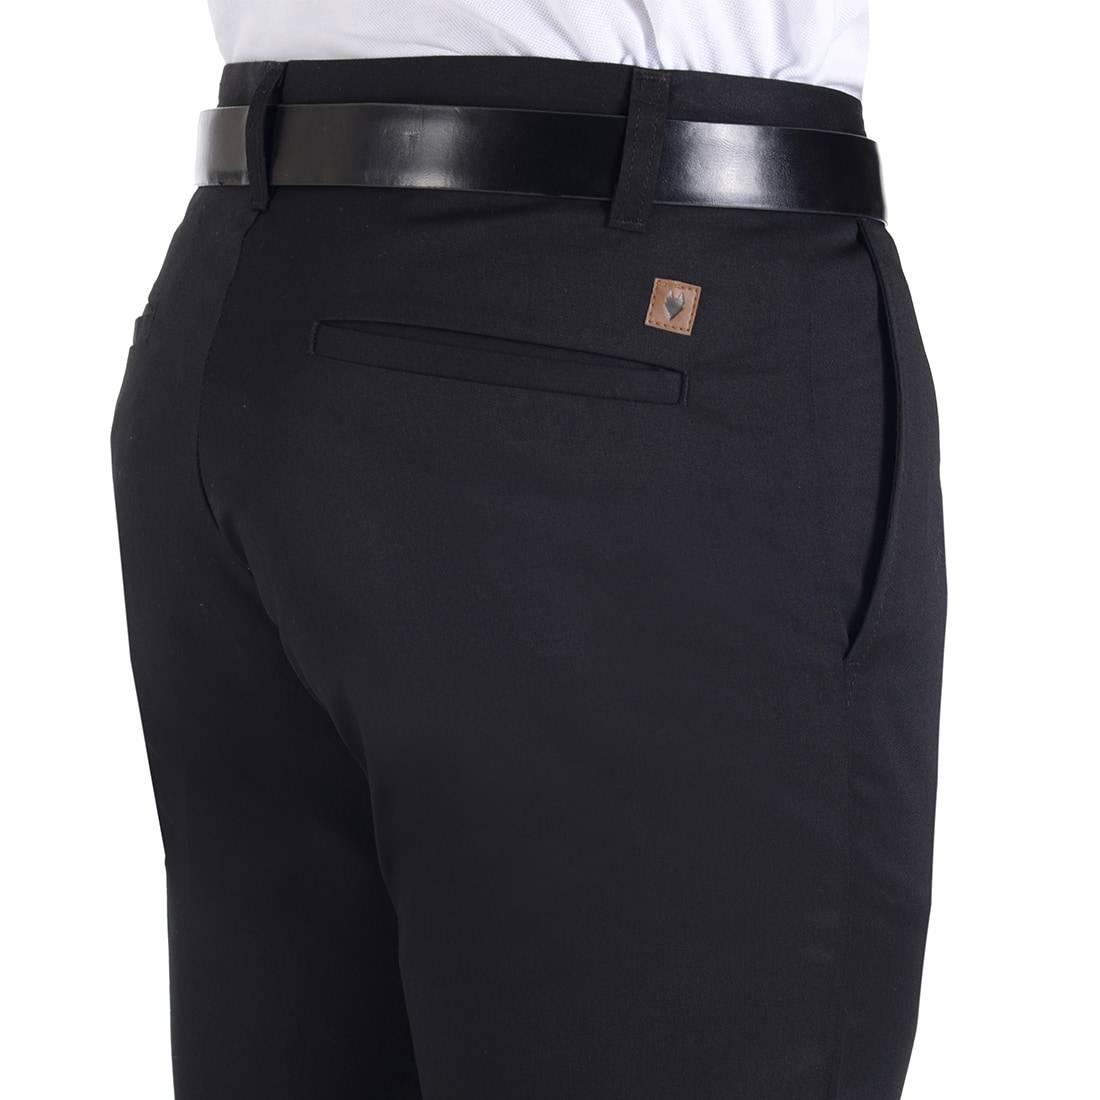 010920418909-04-Pantalon-Casual-Slim-Fit-Negro-yale